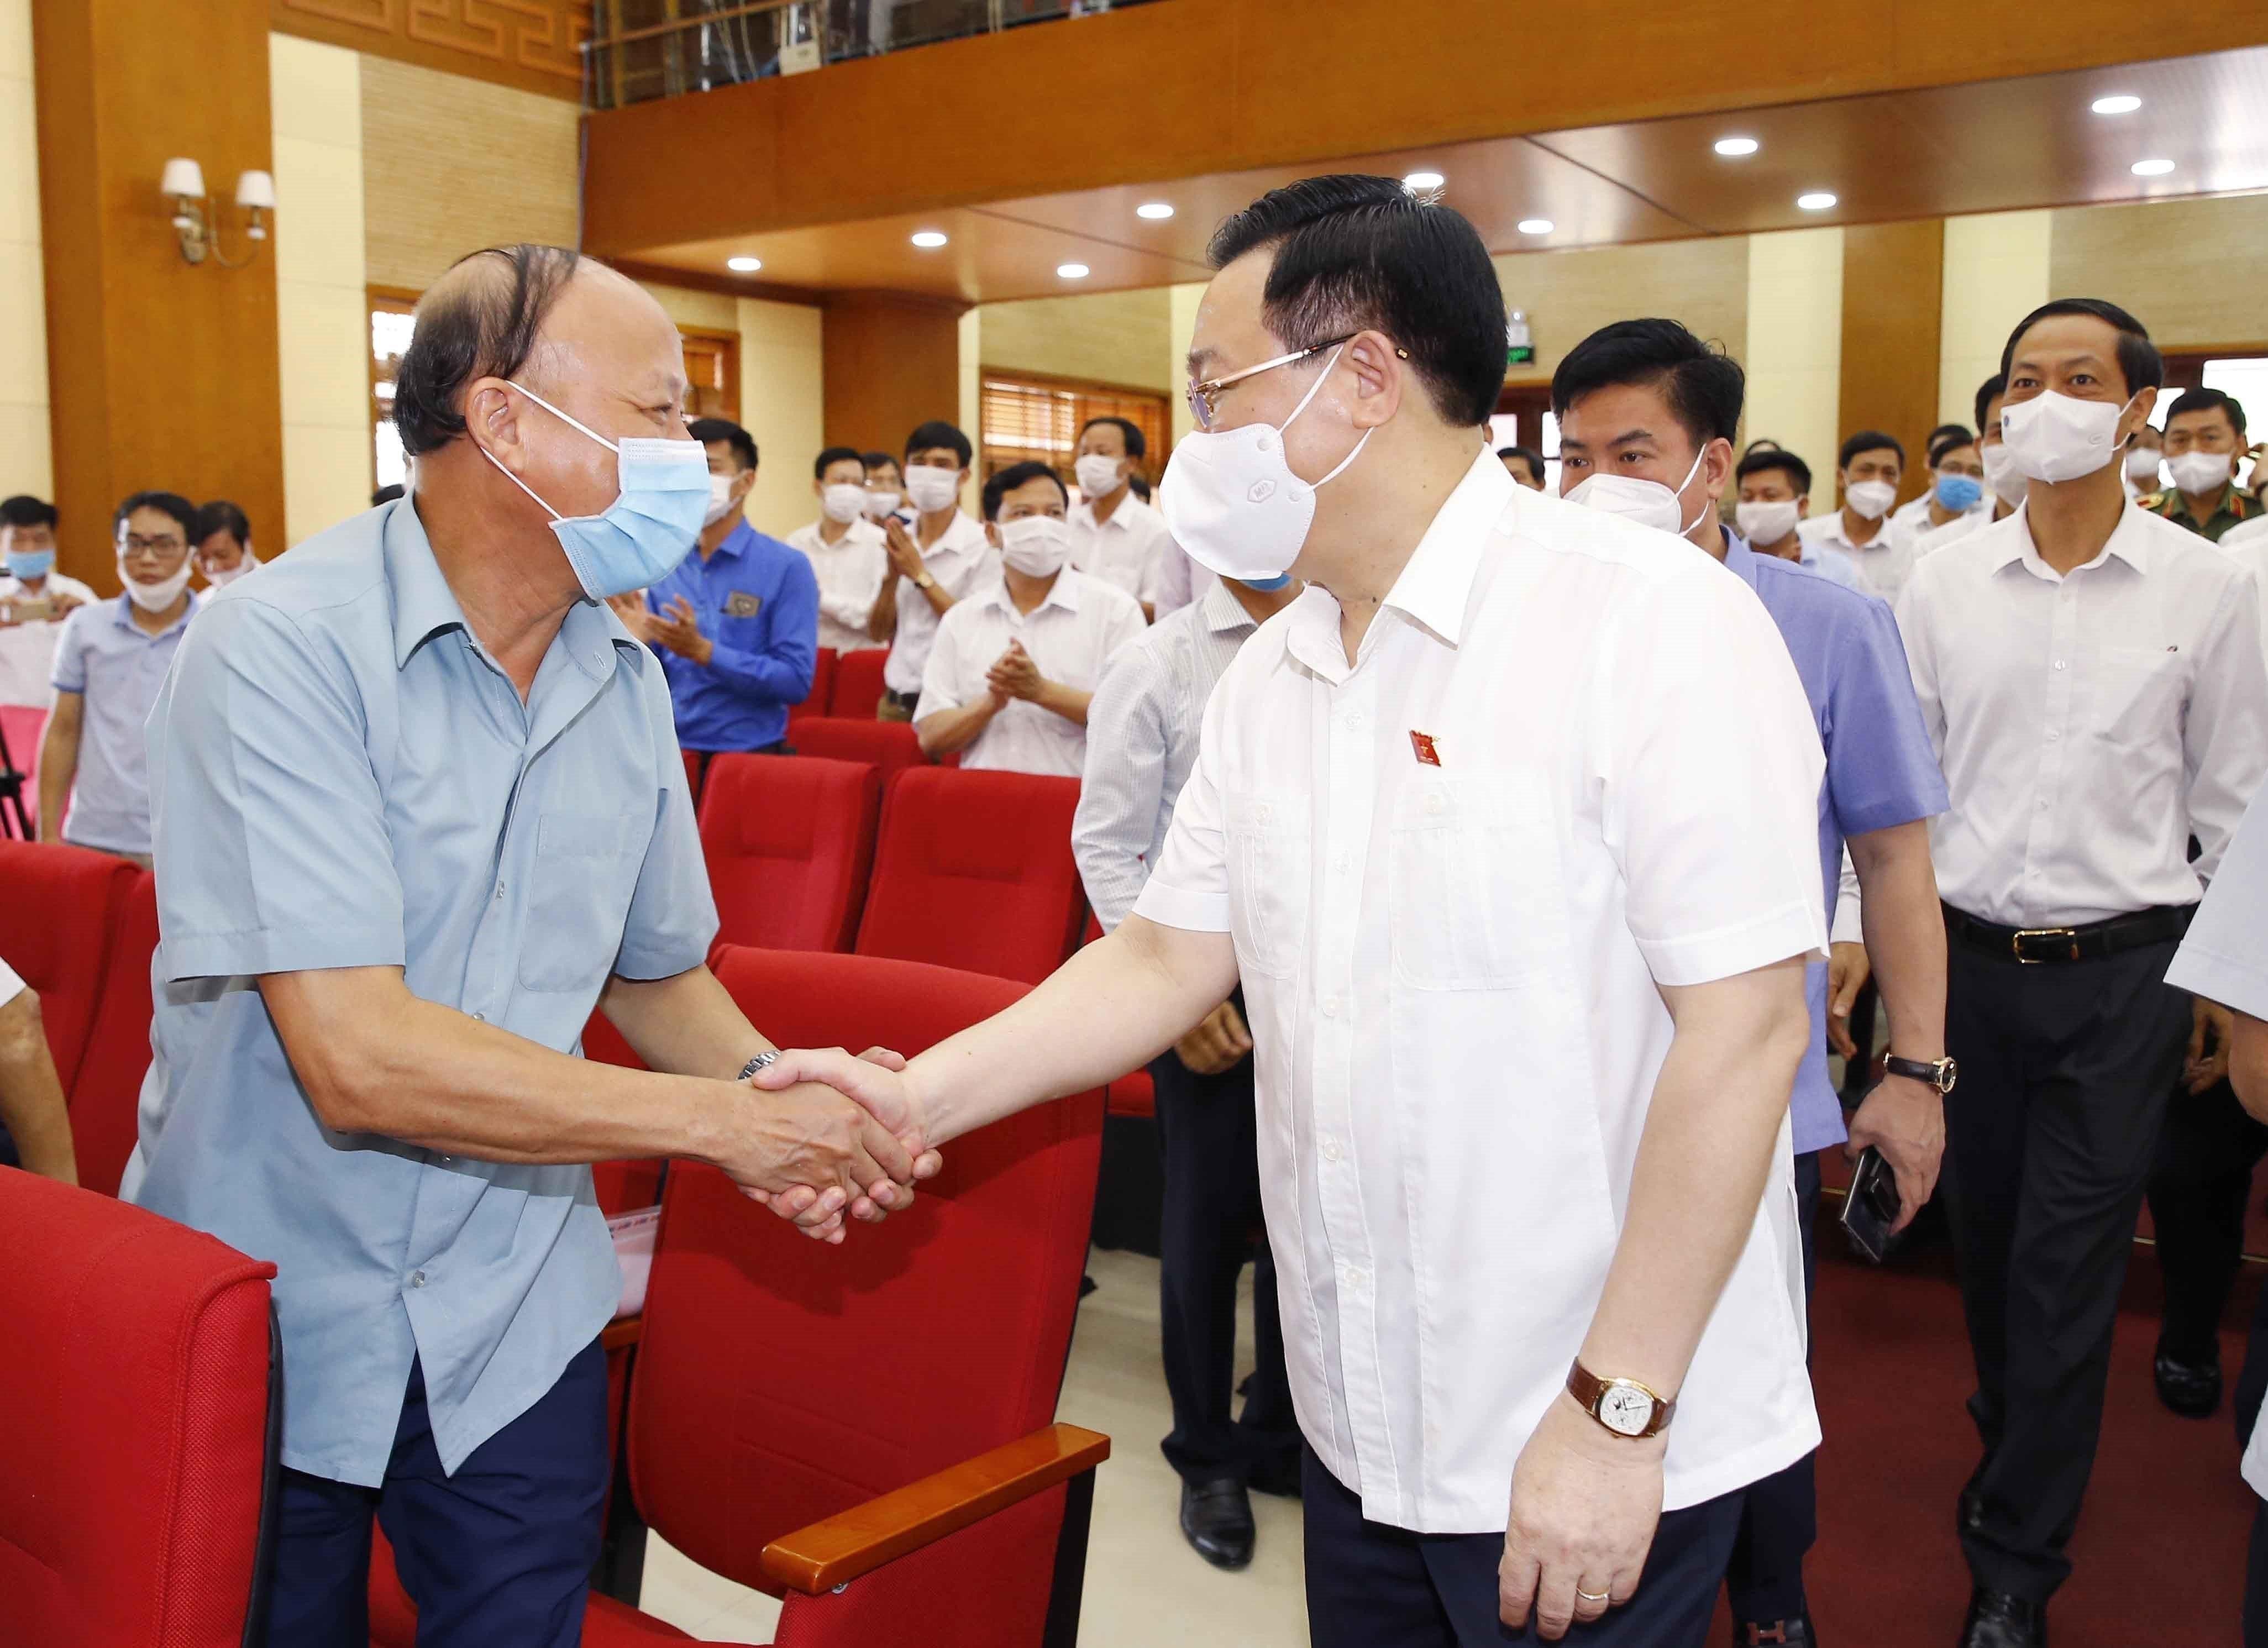 Top legislator meets voters in Hai Phong city hinh anh 3